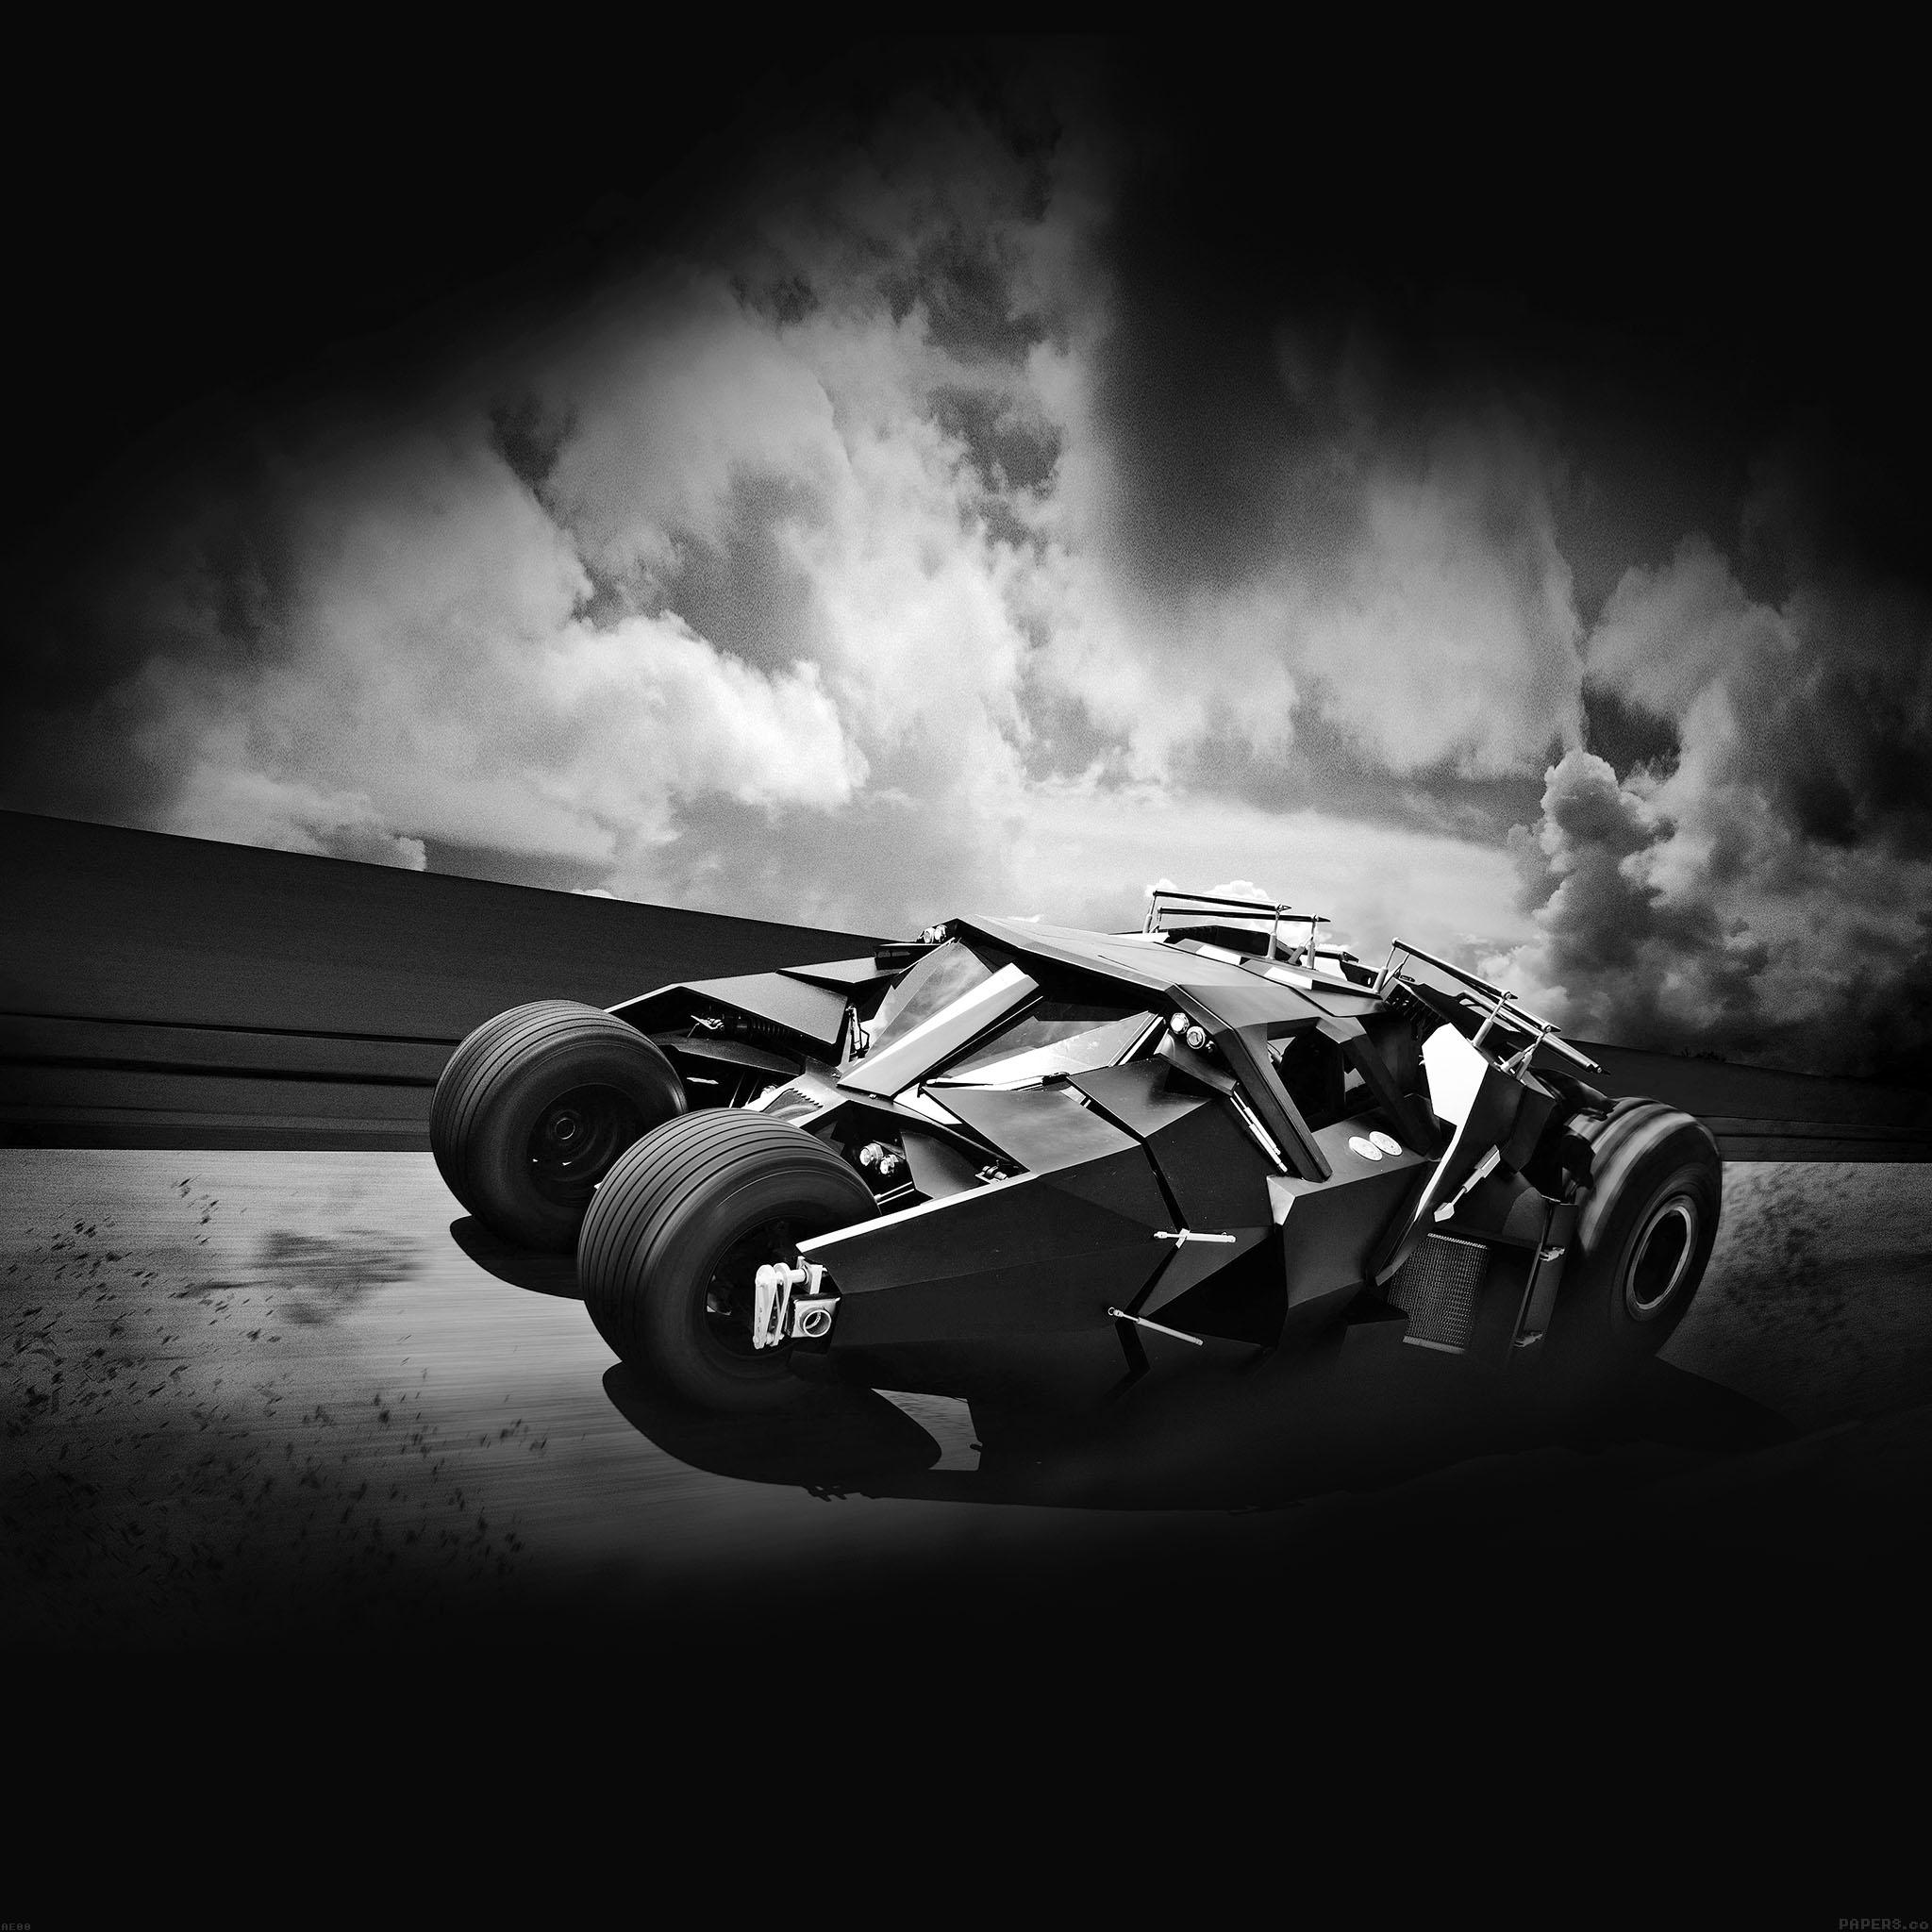 Ae00-batcar-batman-returns-highway-art-hero